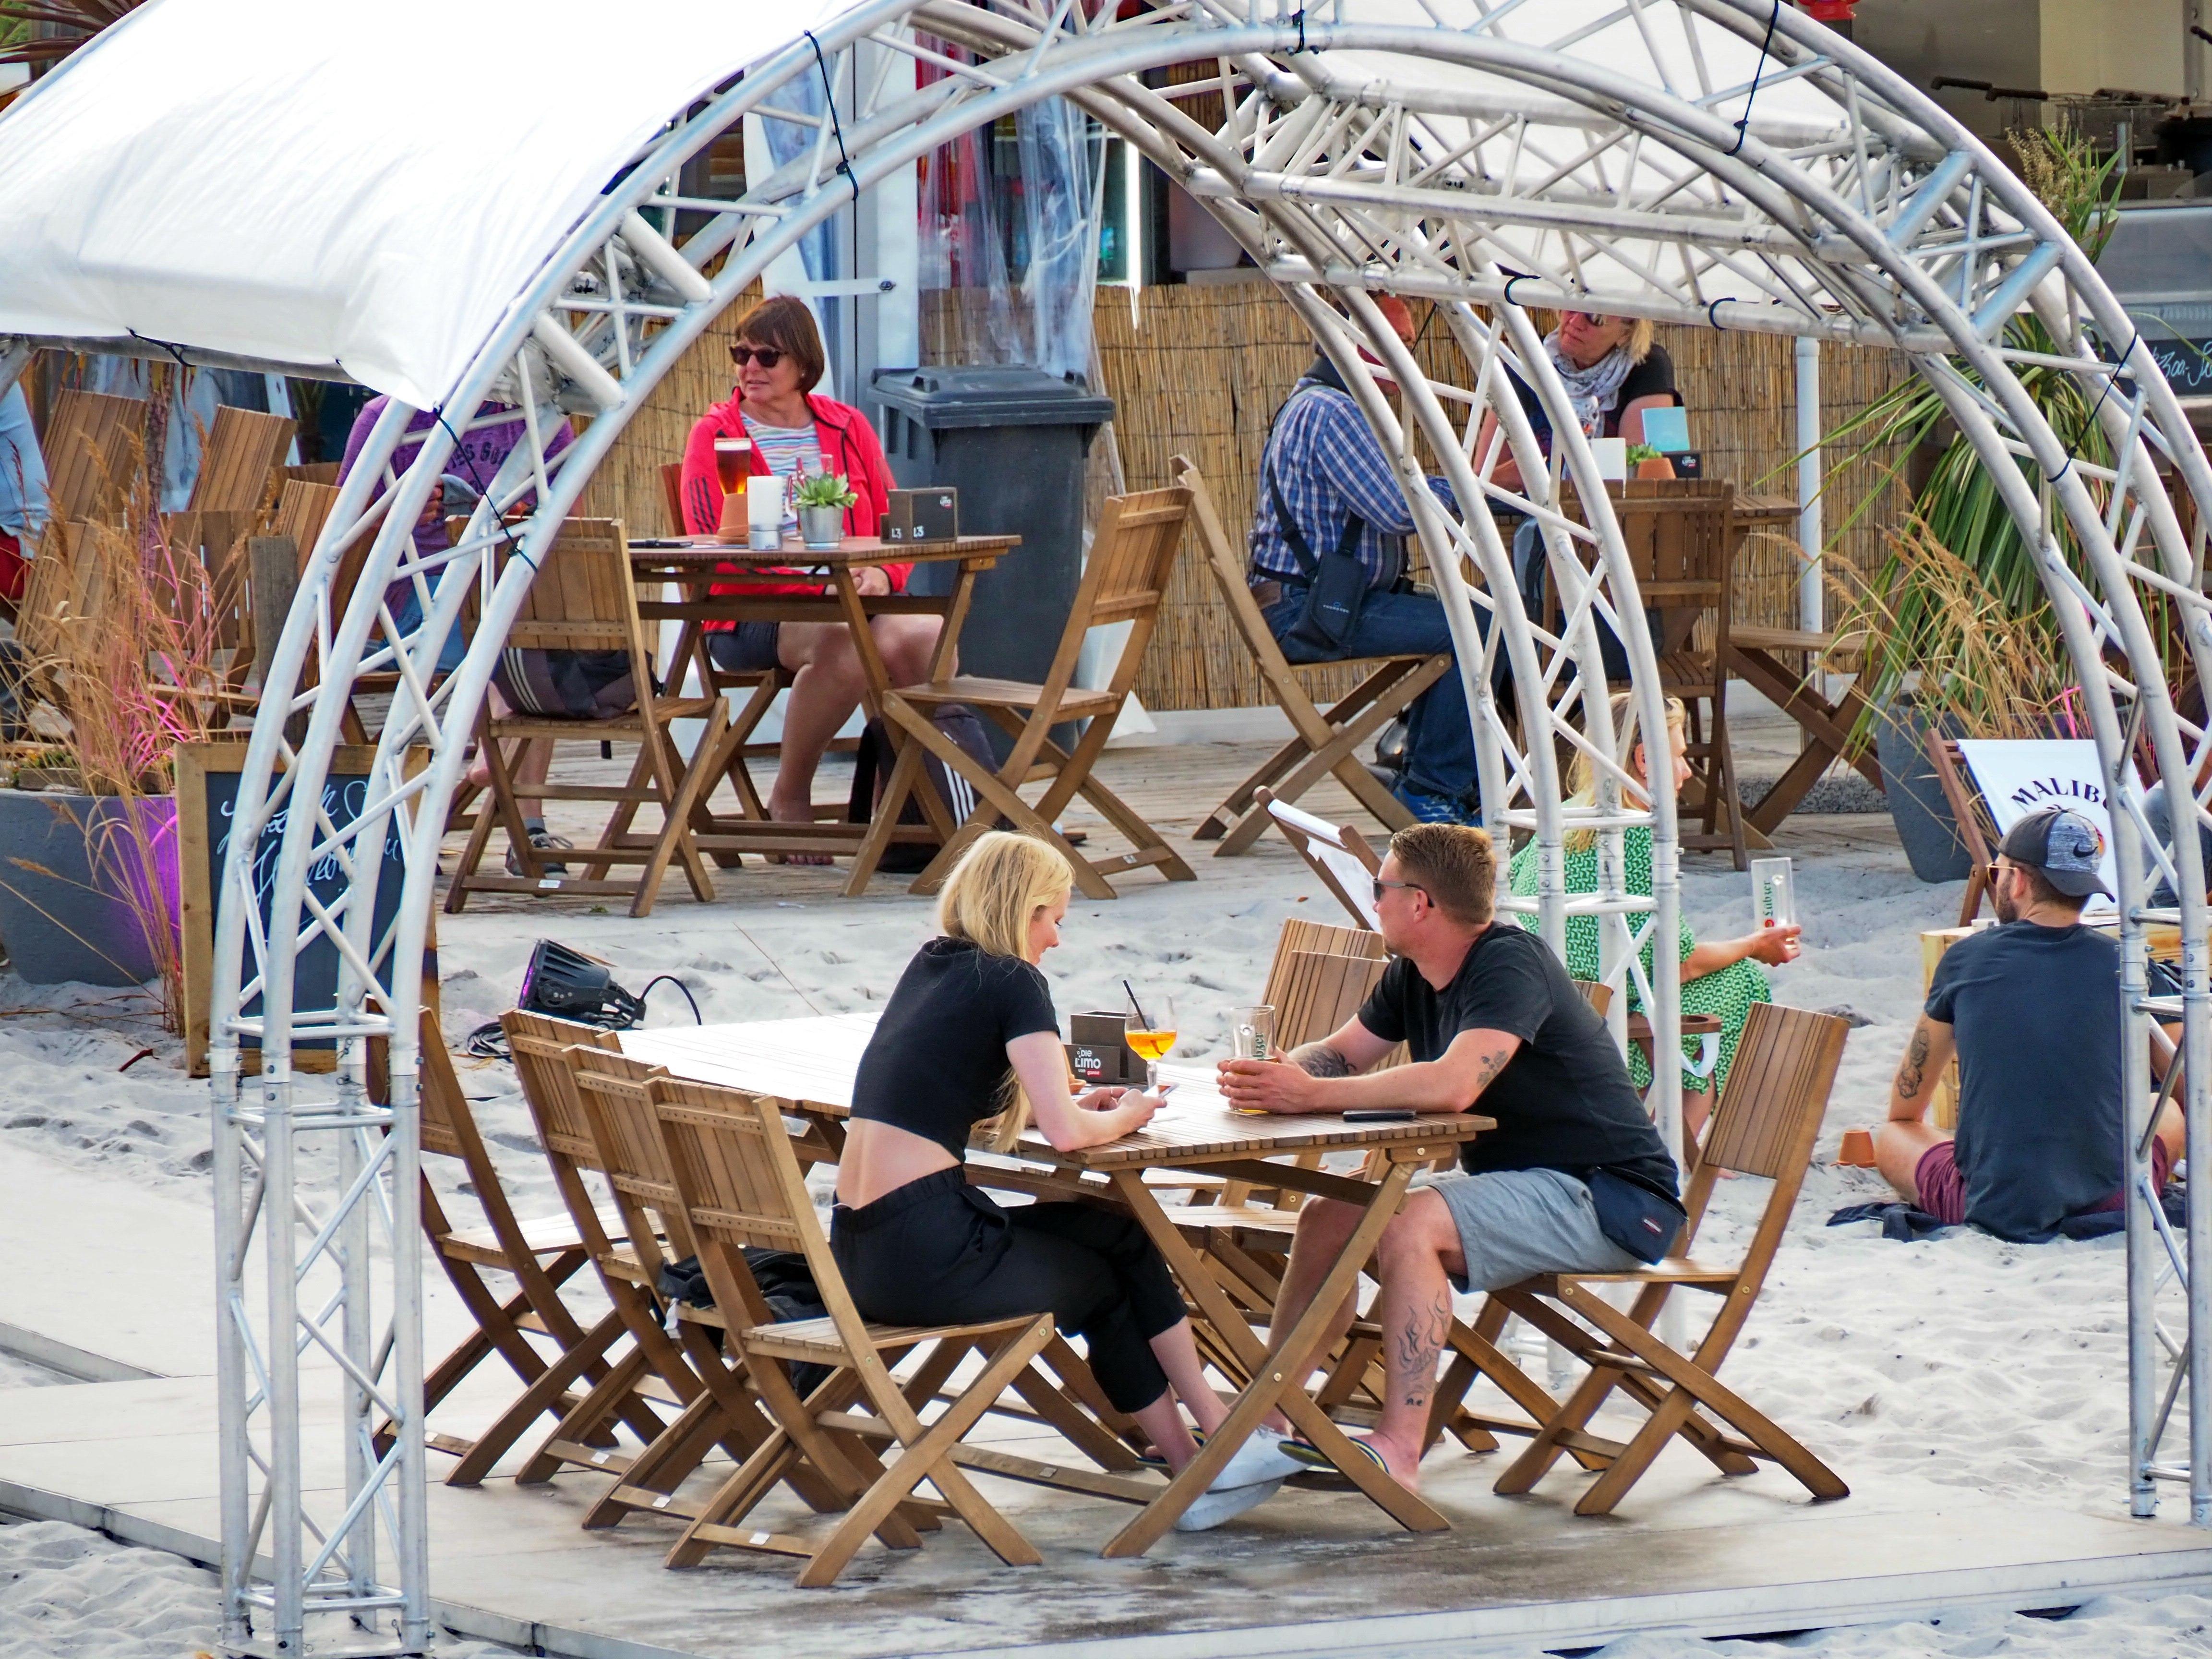 Beach Lounge Boltenhagen - Die Location, © KV Boltenhagen